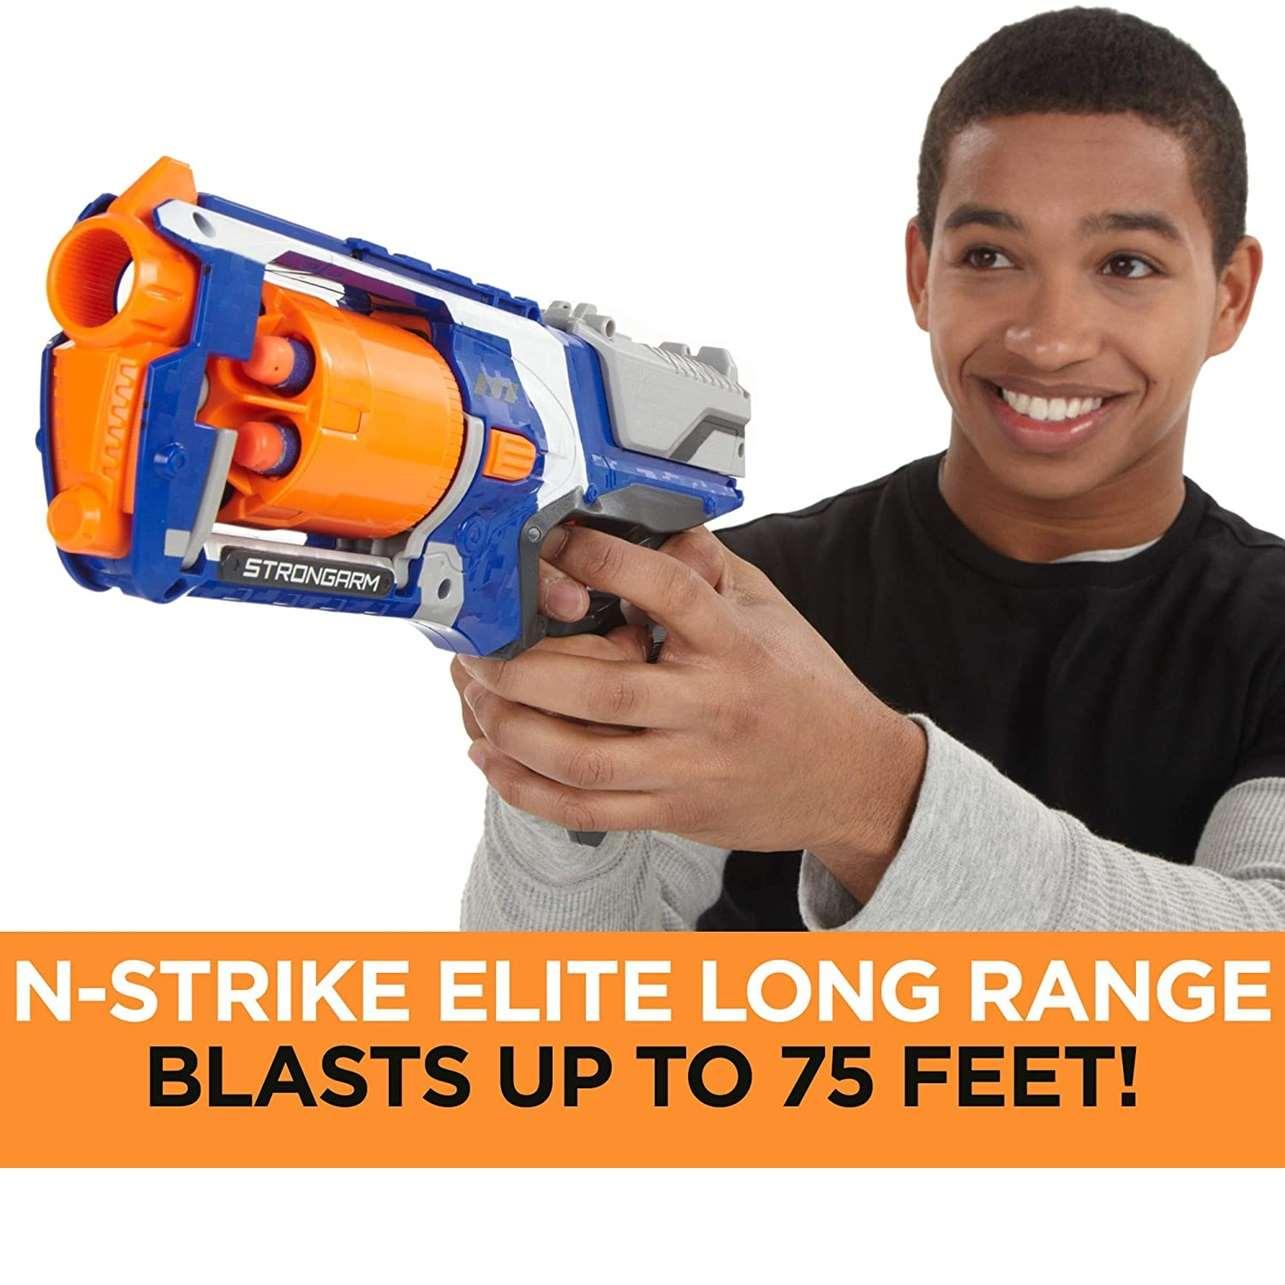 Pistola Hasbro Nerf N -Strike Elite: Strongarm Blaster